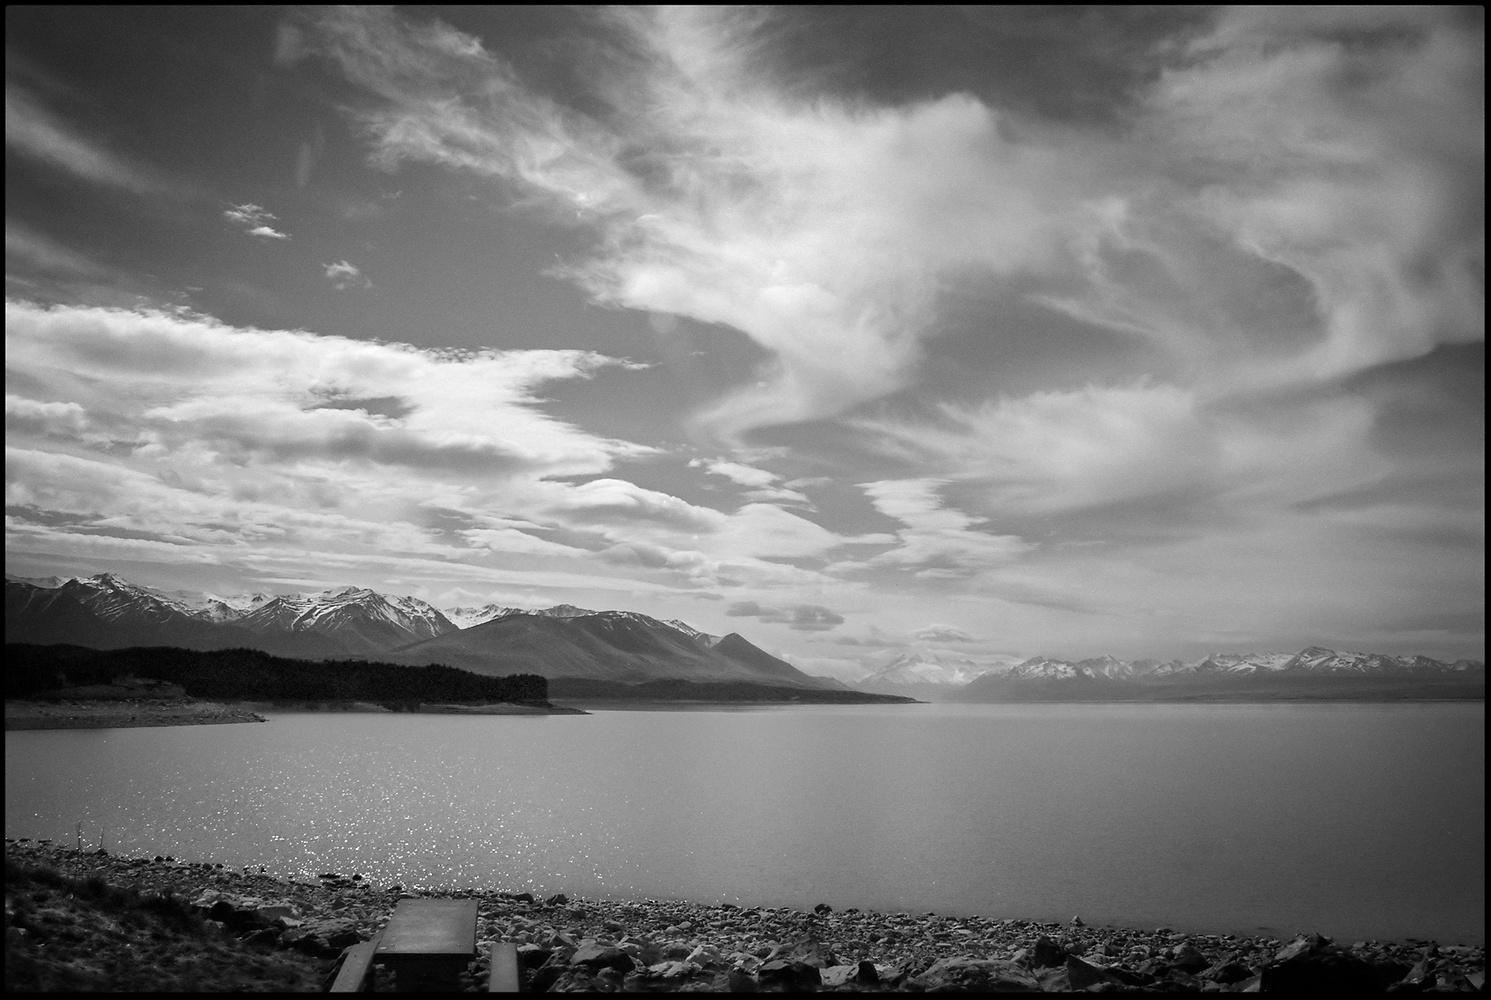 Lake Pukaki, New Zealand by James Stevenson